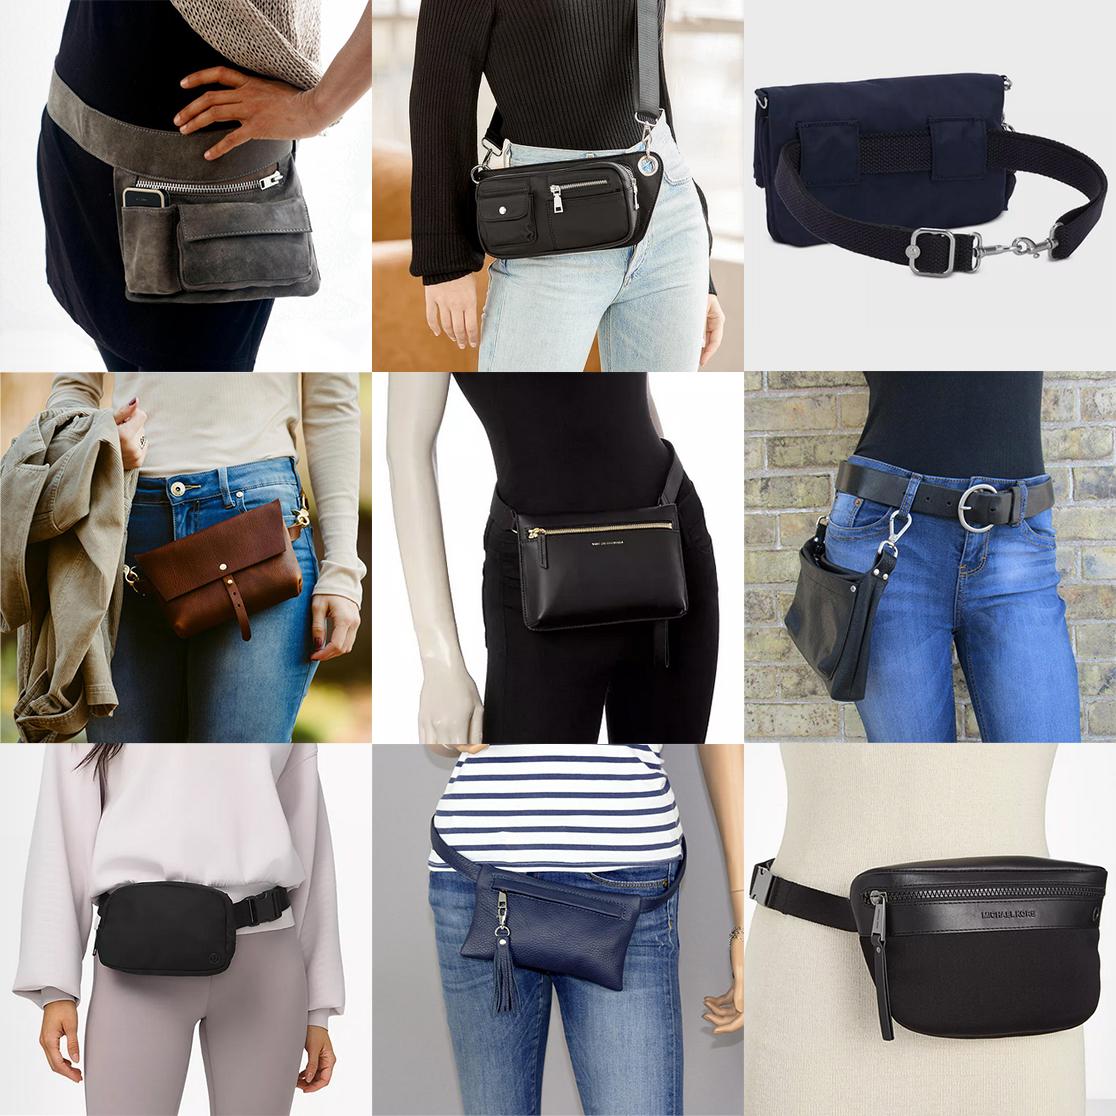 Nine different belt bags, photo